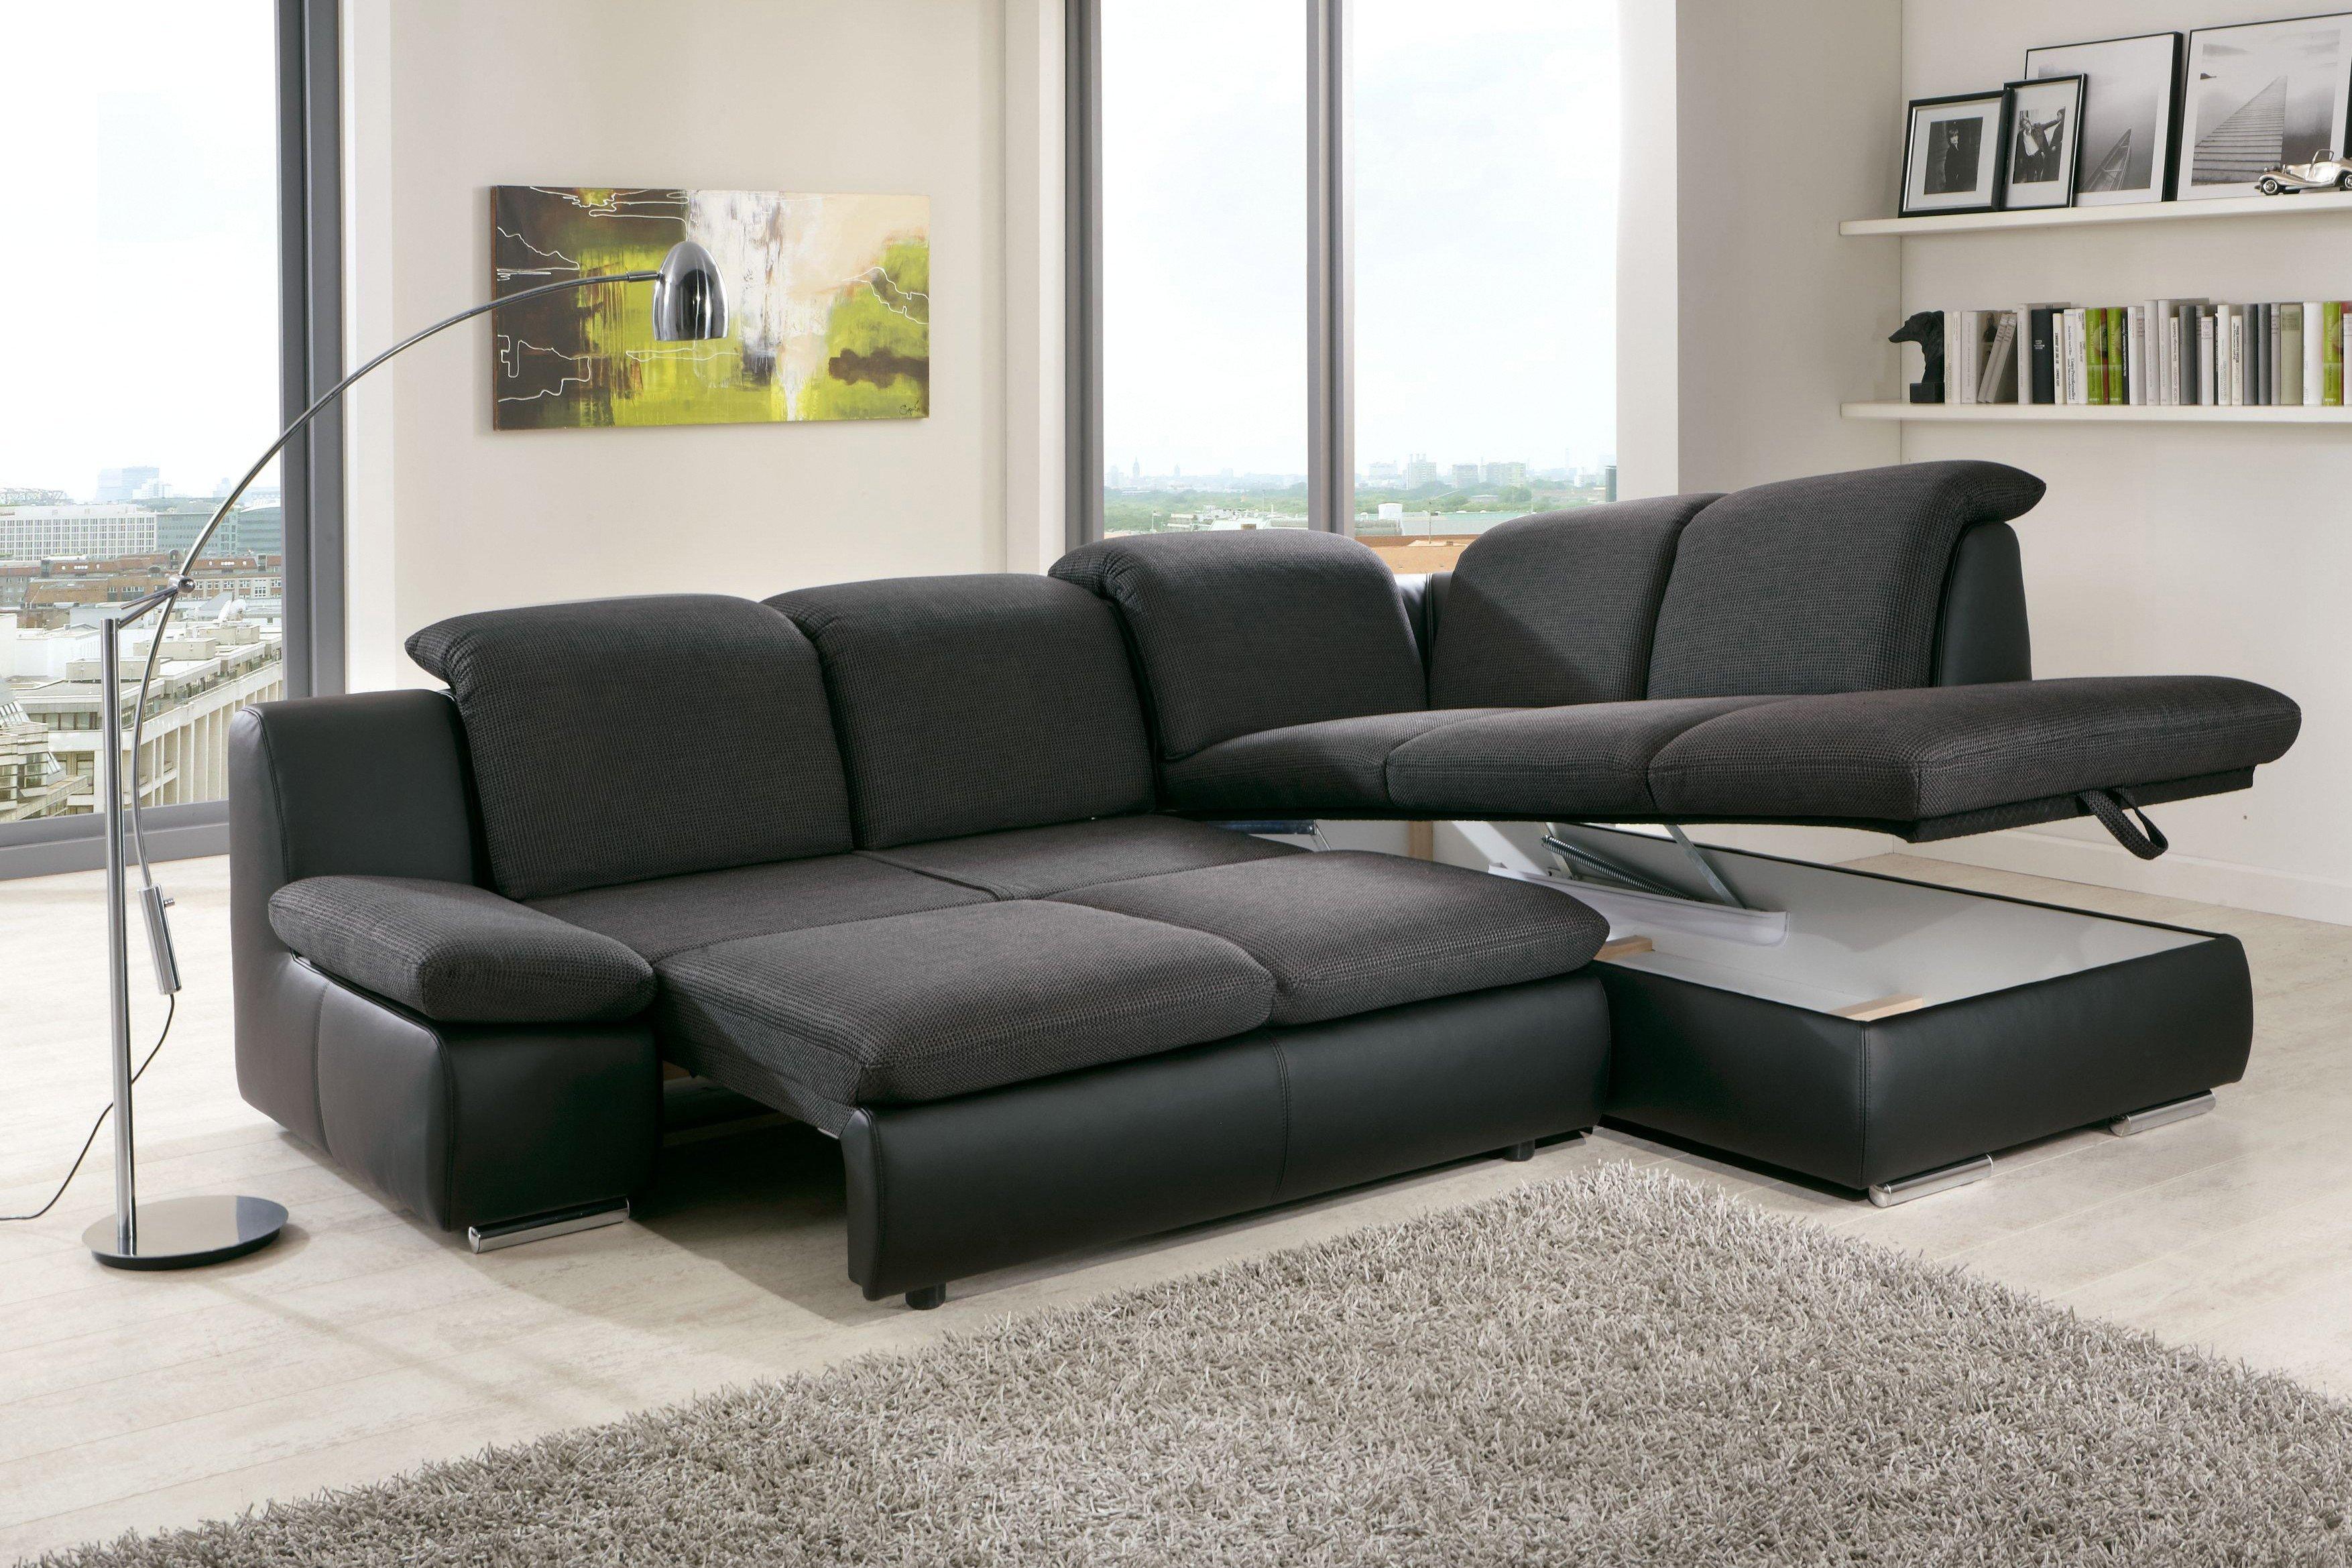 poco schrank angebot interessante ideen f r. Black Bedroom Furniture Sets. Home Design Ideas